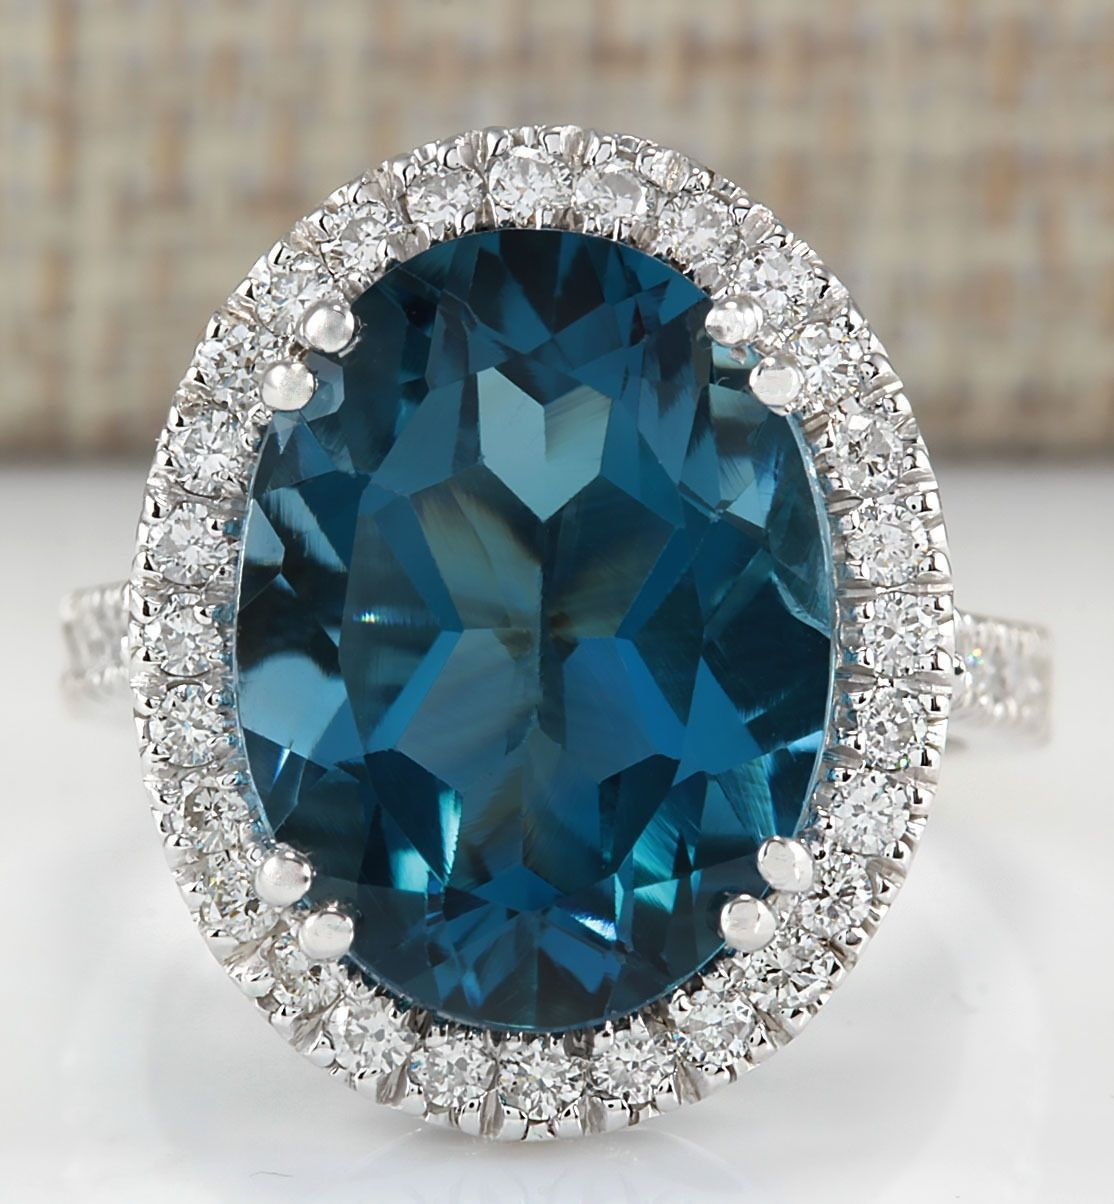 buy london topaz gemstone ring,stone ring,silver ring,bezel ring,natural stone ring,round shape stone,925 silver ring